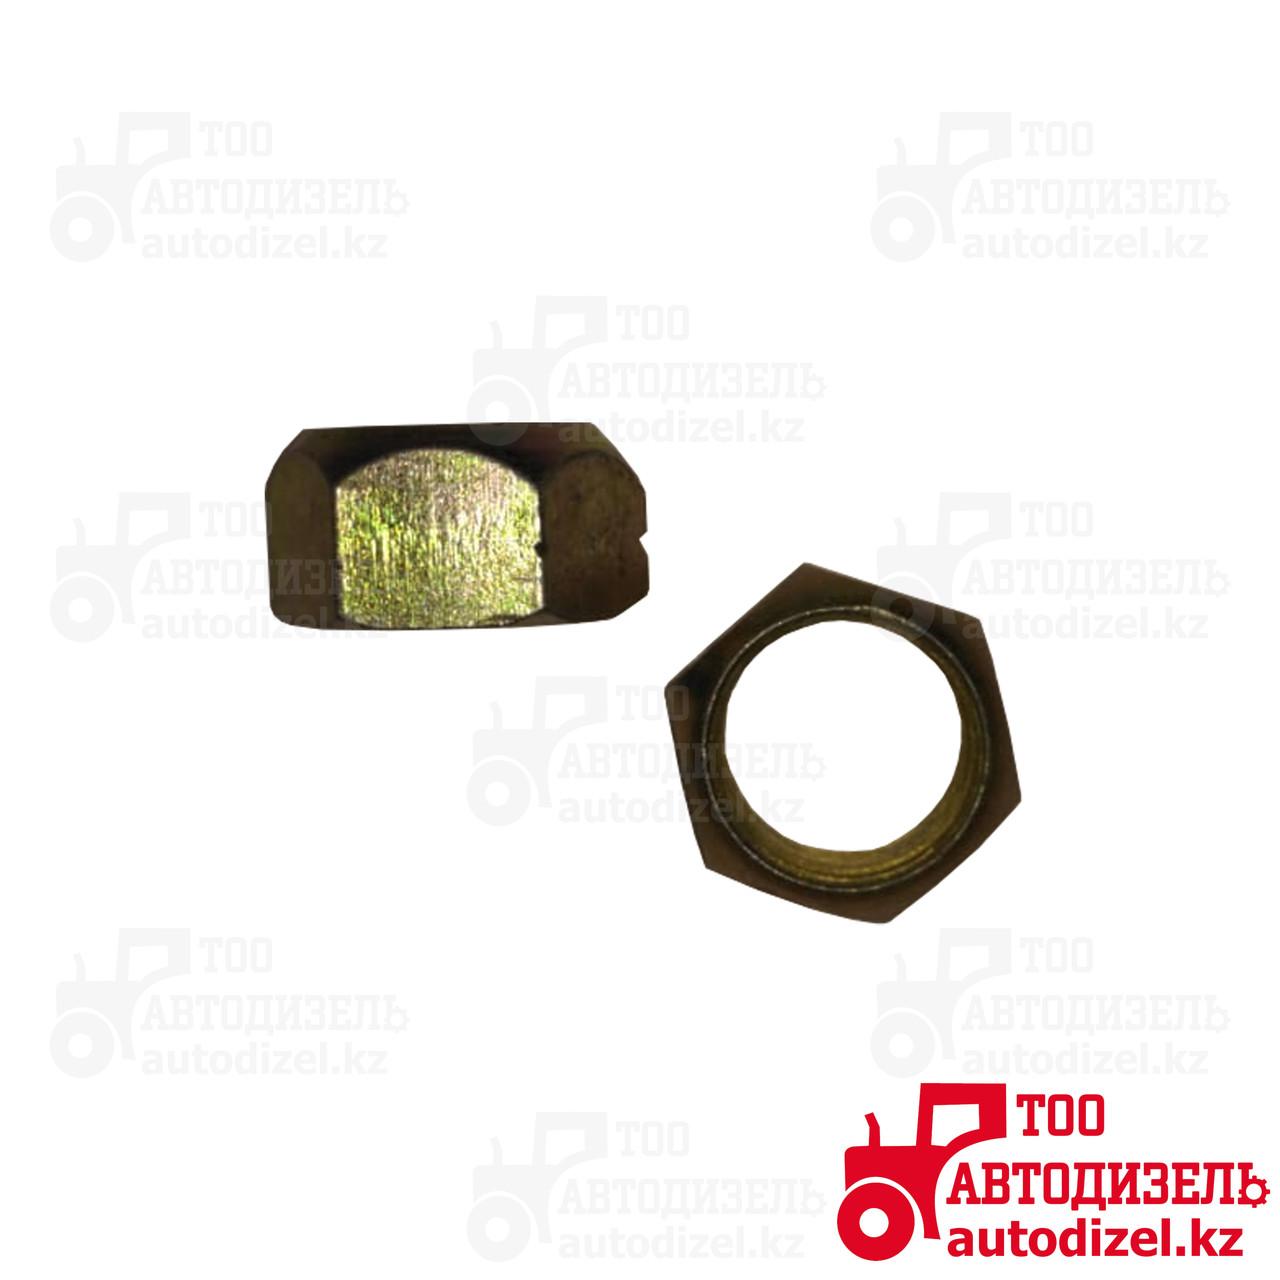 Гайка крепления диска колеса 120-3104057  задняя левая резьба